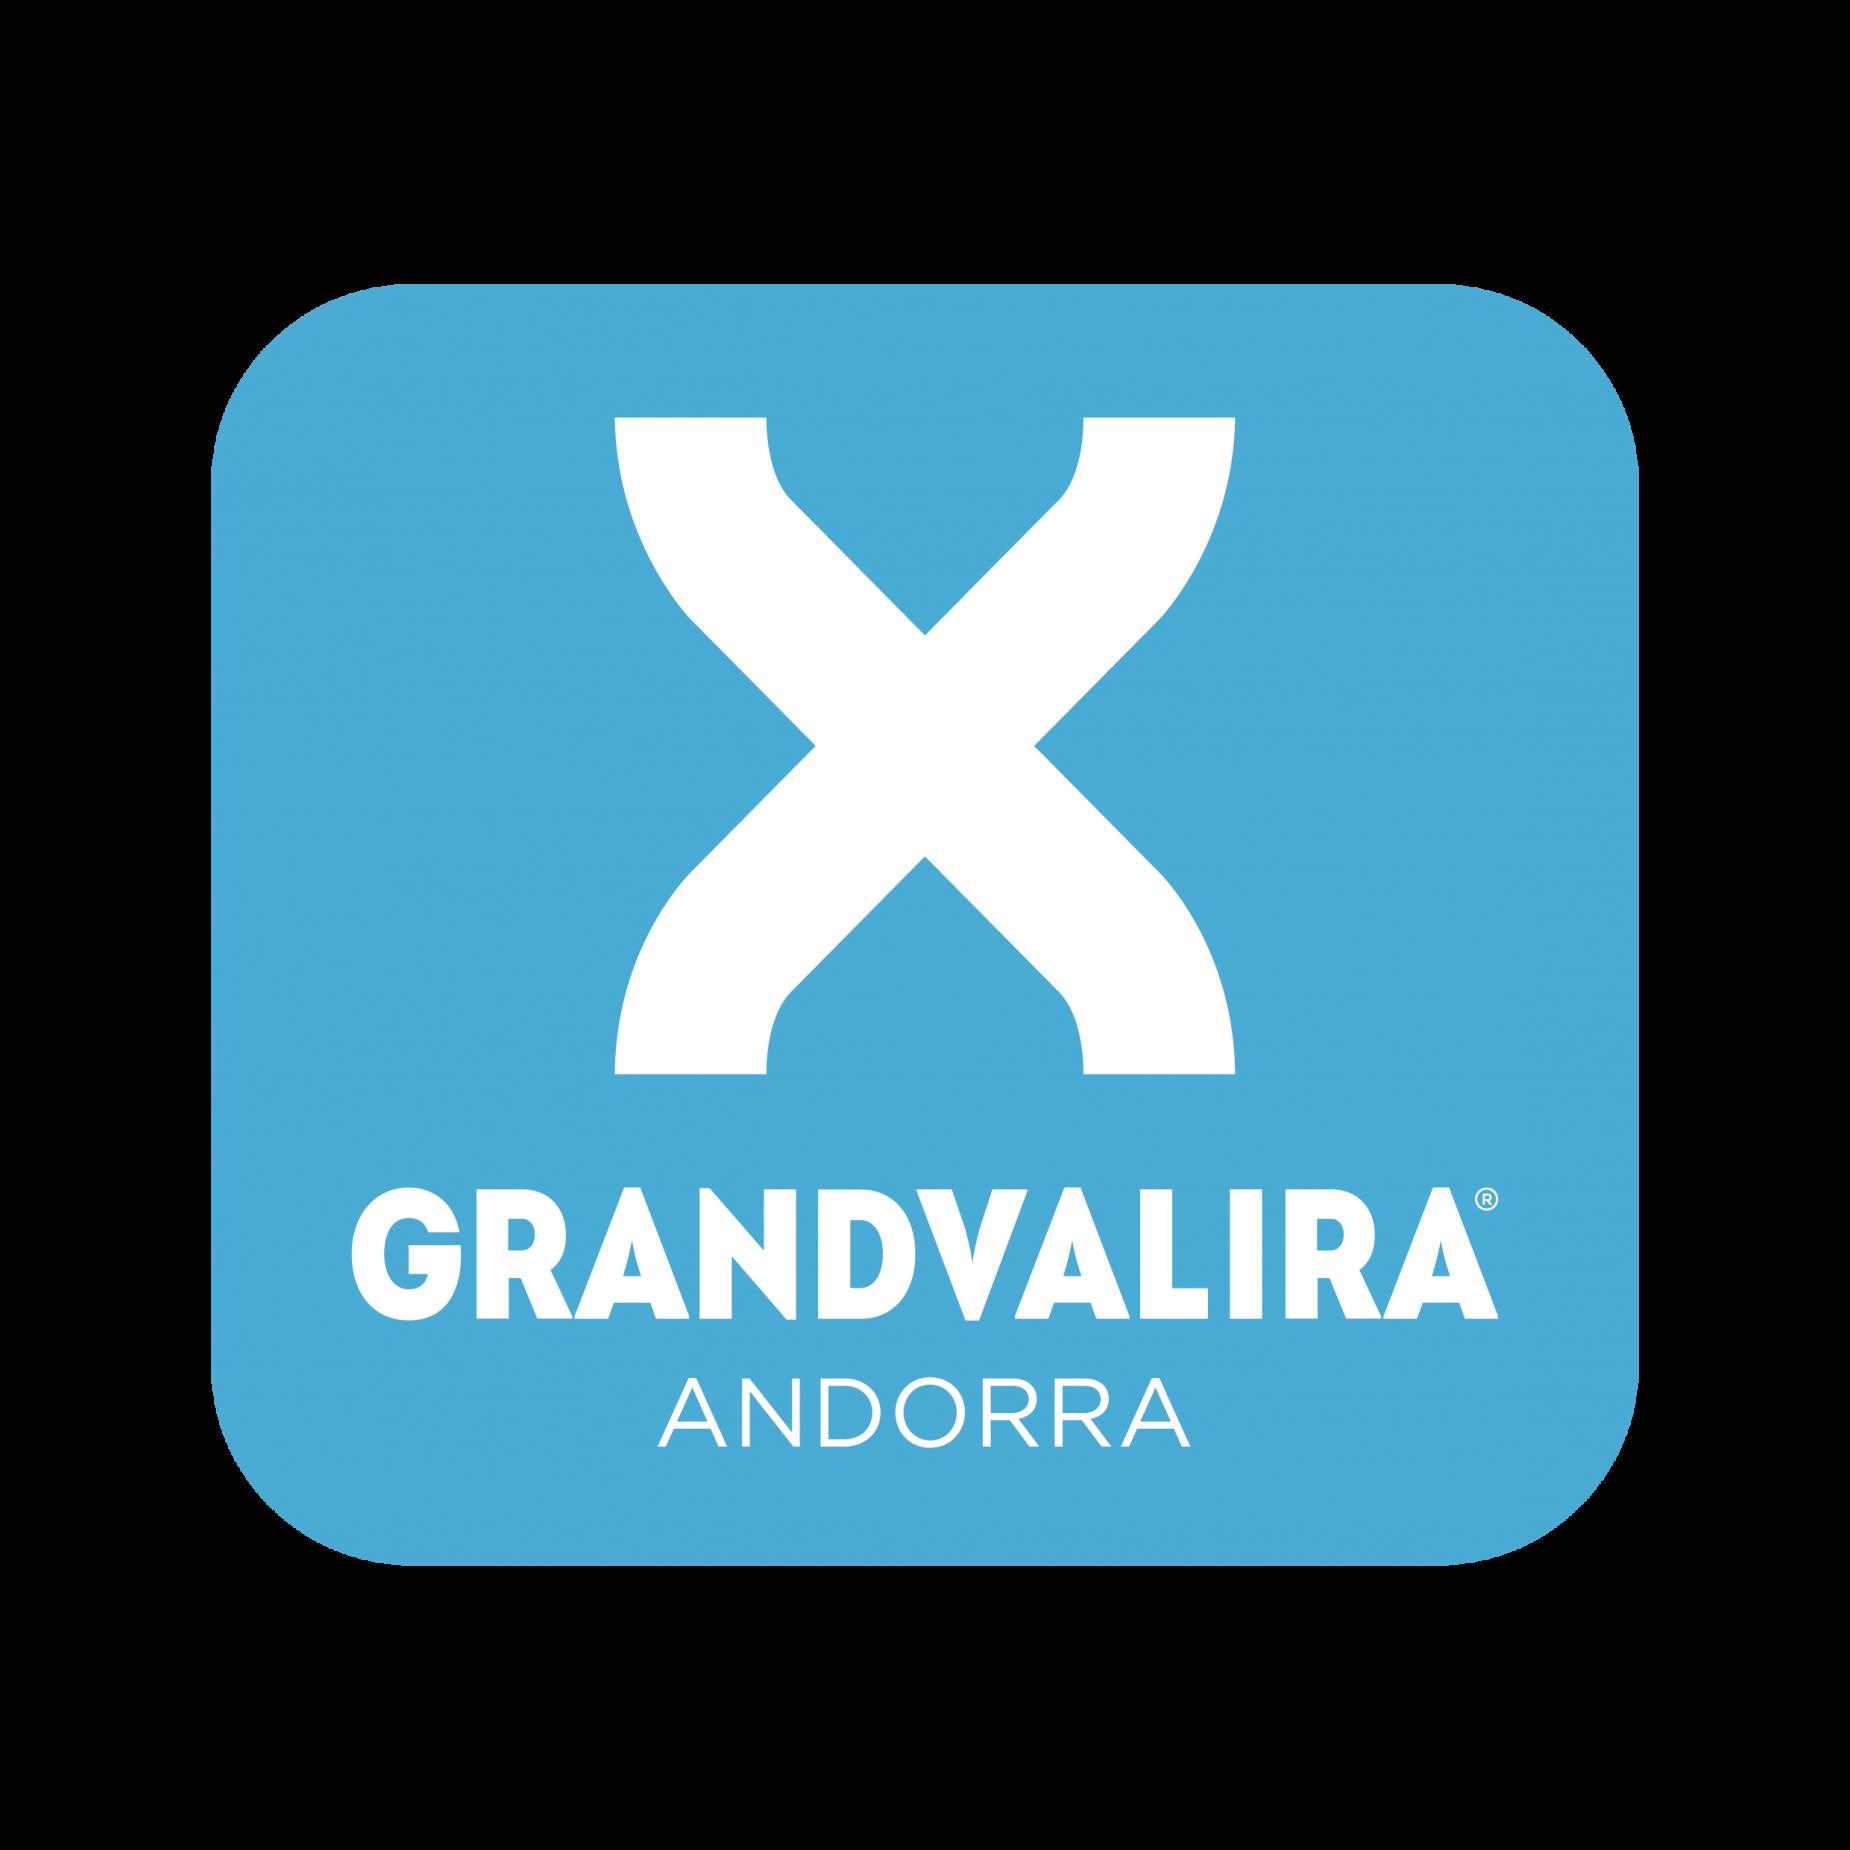 1 FORFAIT DE DIA GRANDVALIRA